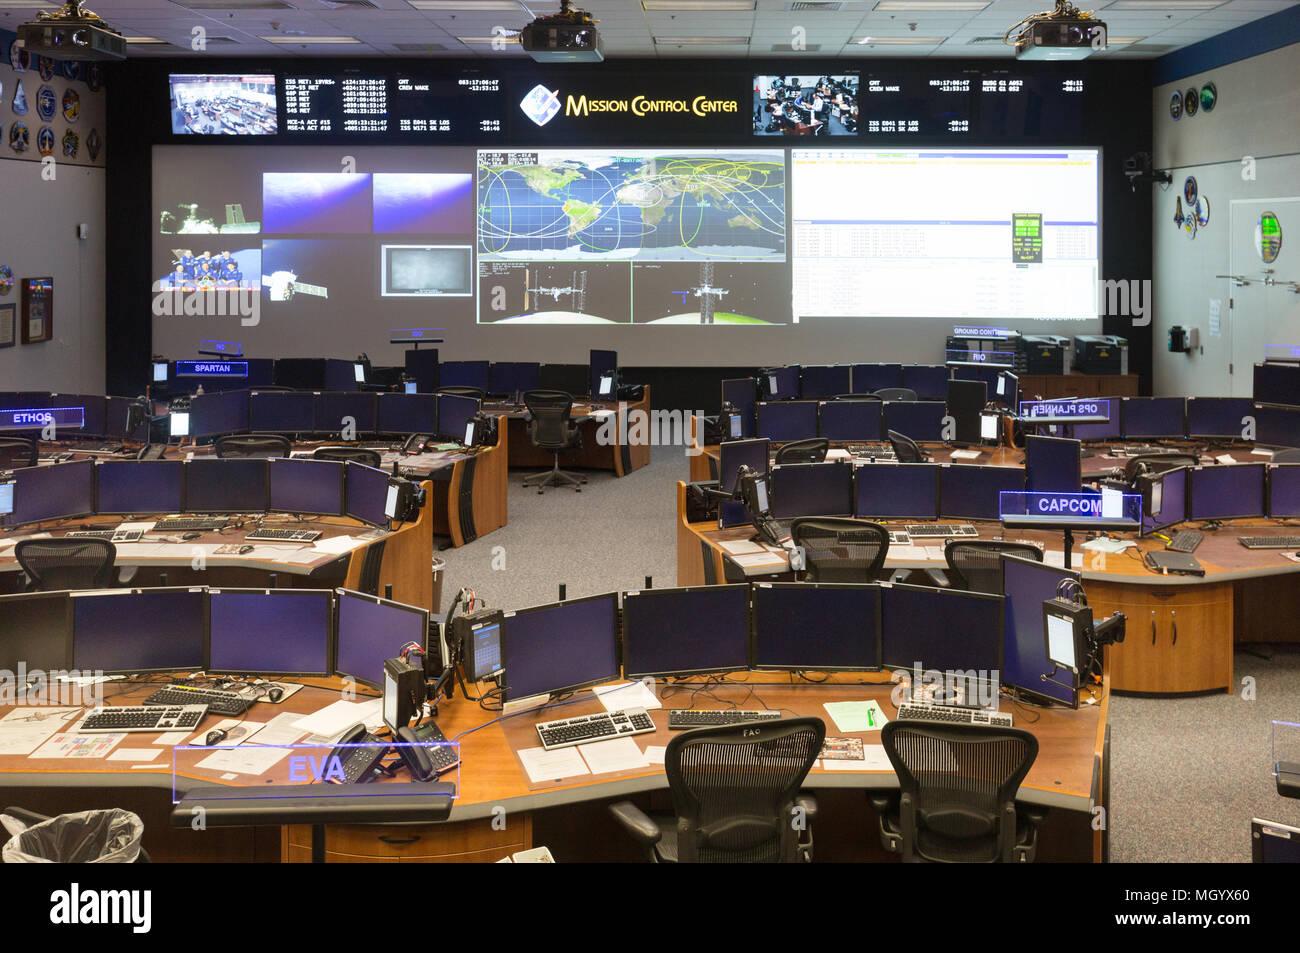 Mission Control Center, NASA Johnson Space Center, Houston, Texas USA - Stock Image